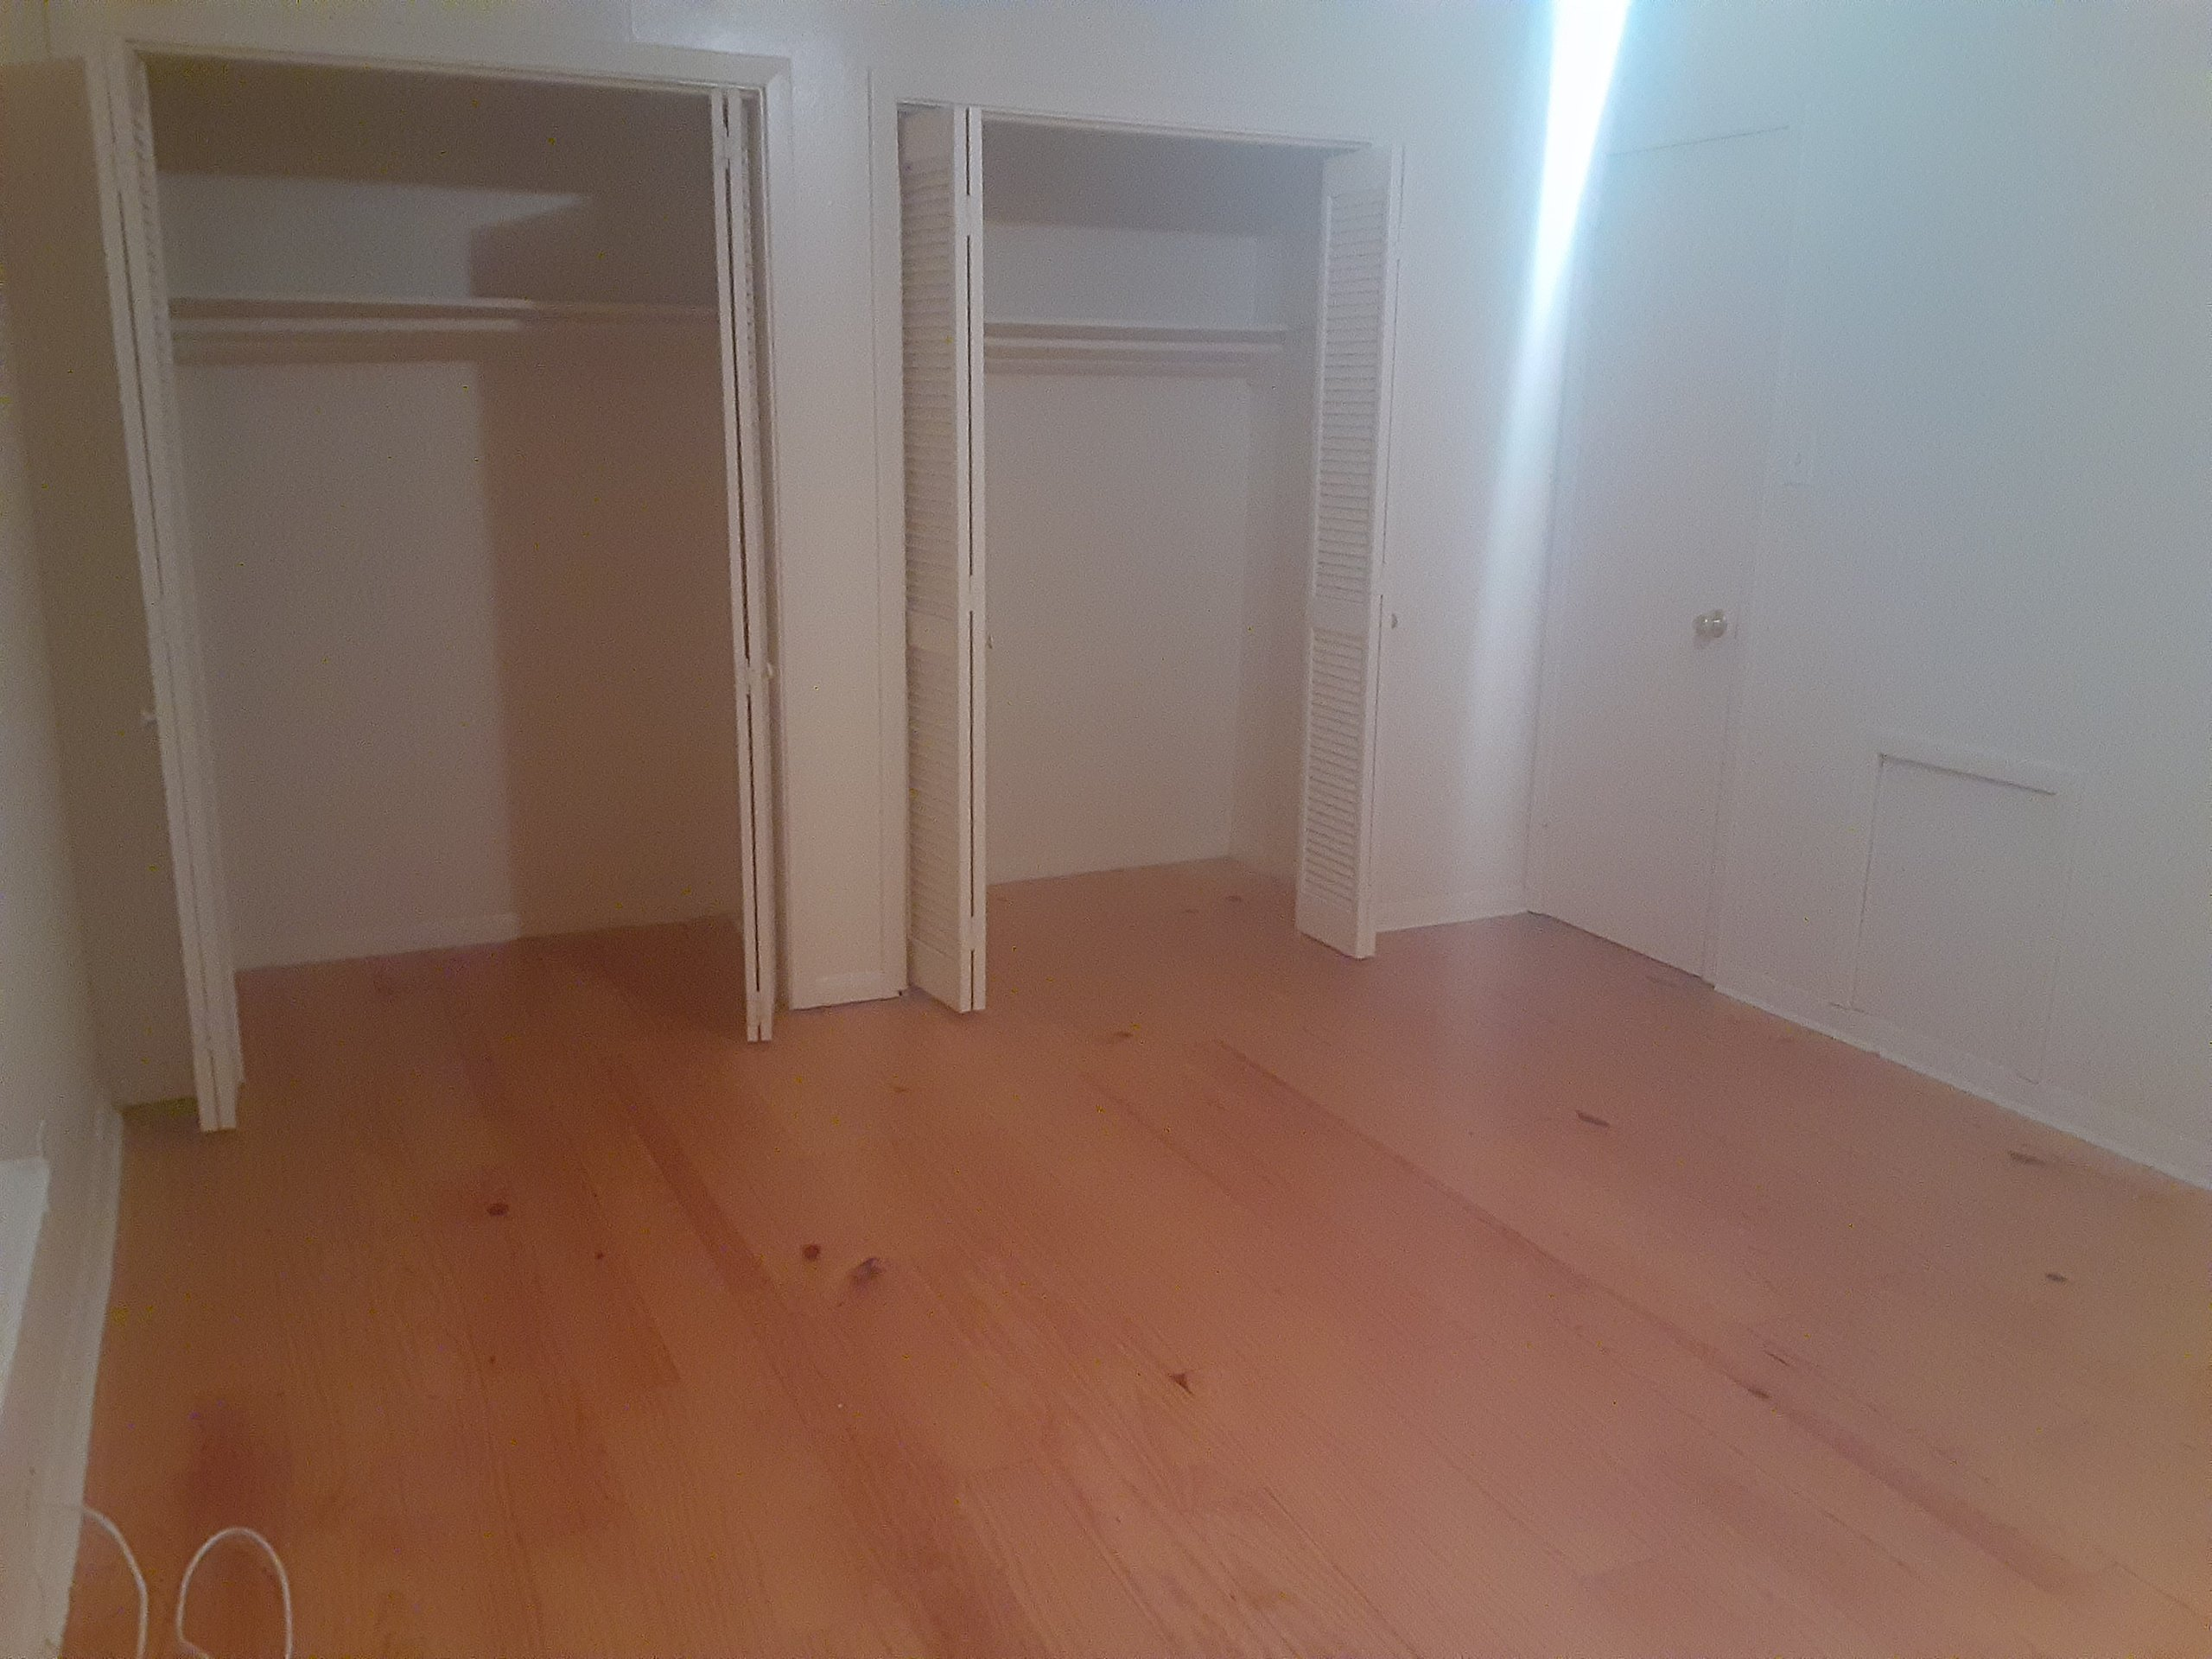 12x18 Bedroom self storage unit